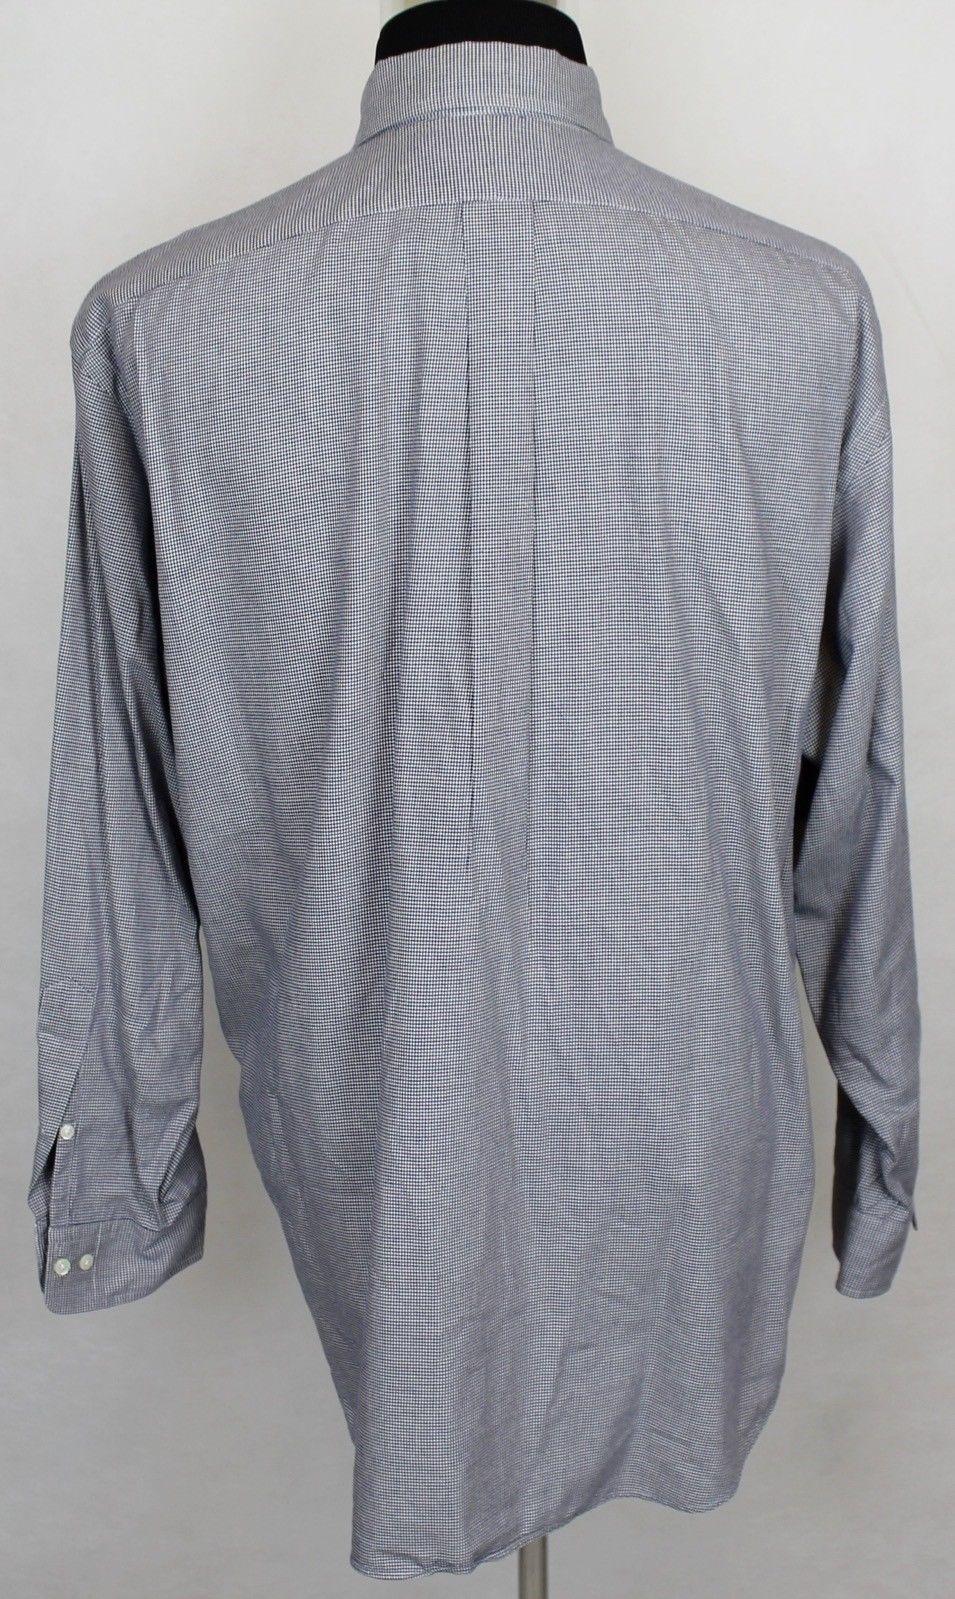 RALPH LAUREN Yarmouth Mens LS Blue Micro-Check Button Front Shirt sz 17-35